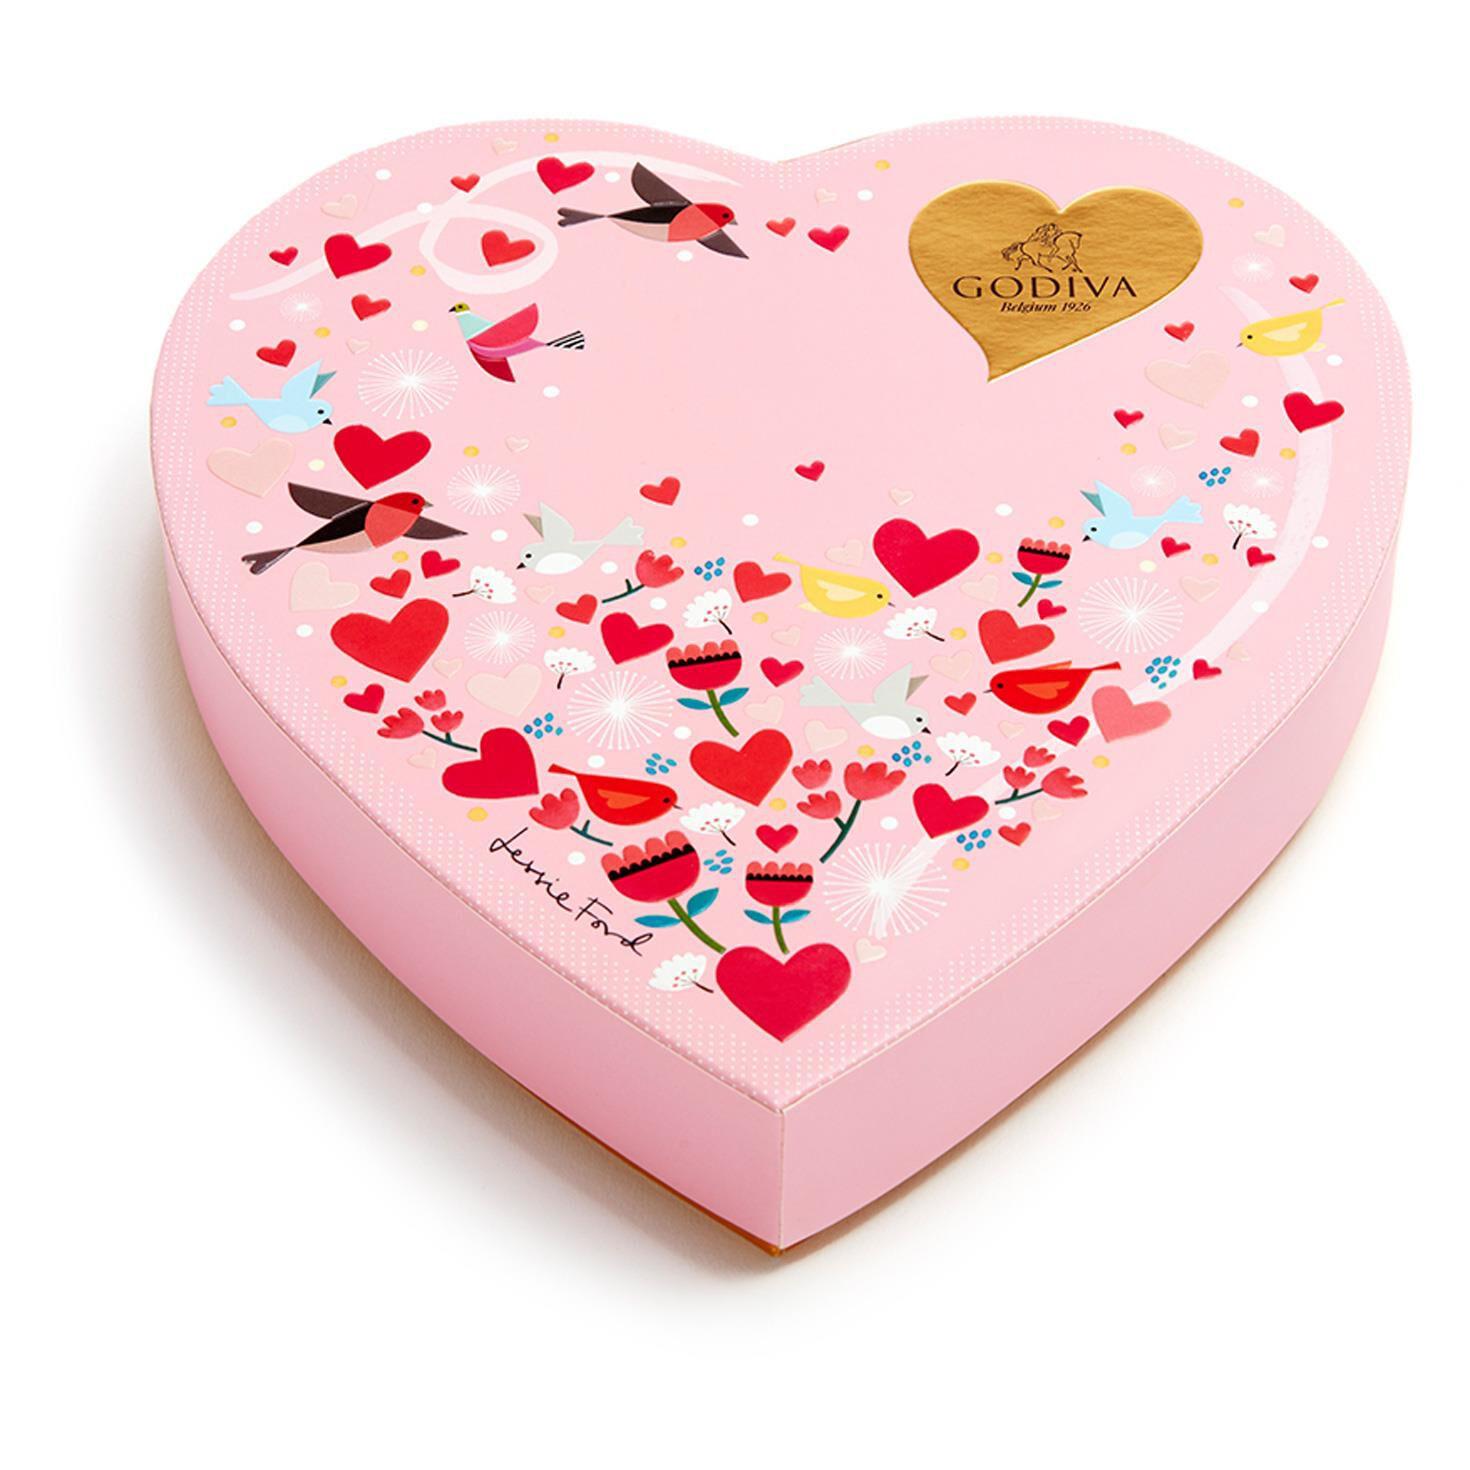 Godiva Chocolatier Assorted Chocolates Valentine\'s Day Heart Gift ...